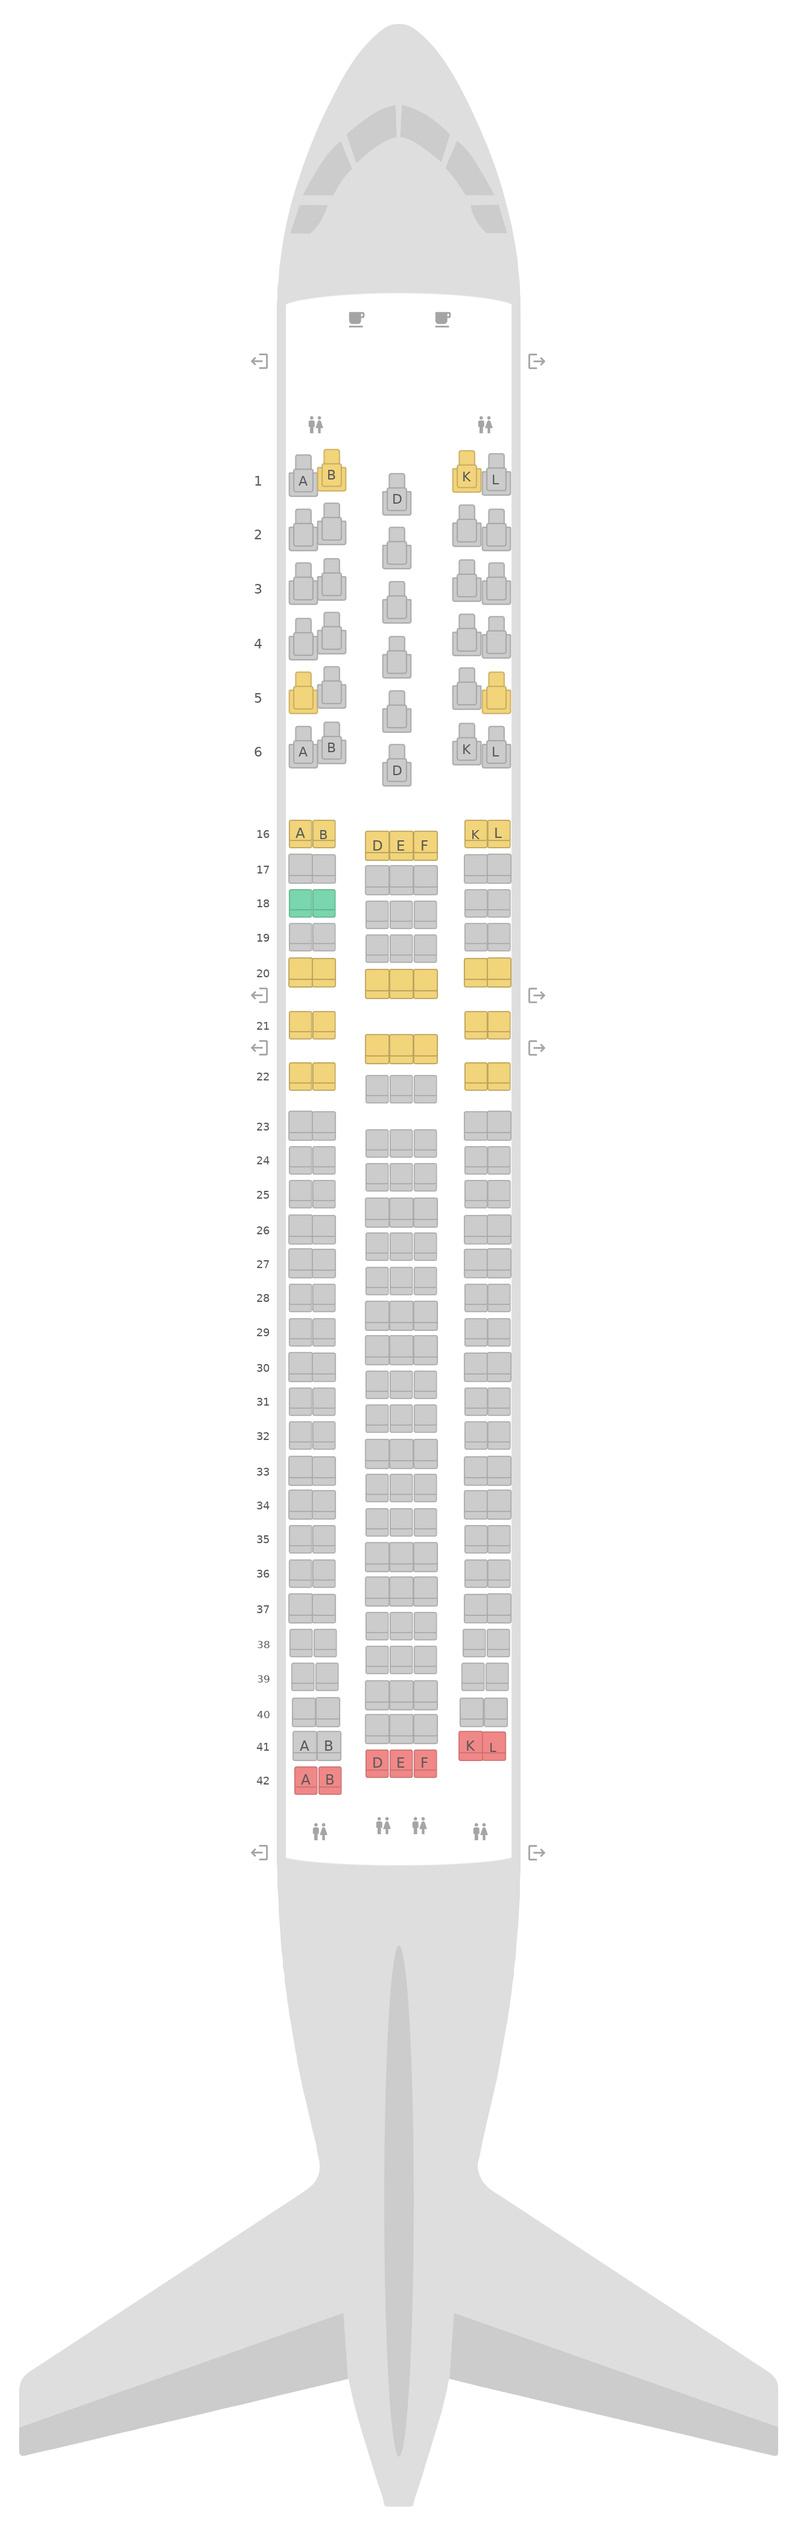 Seat Map United Boeing 767-300ER v1